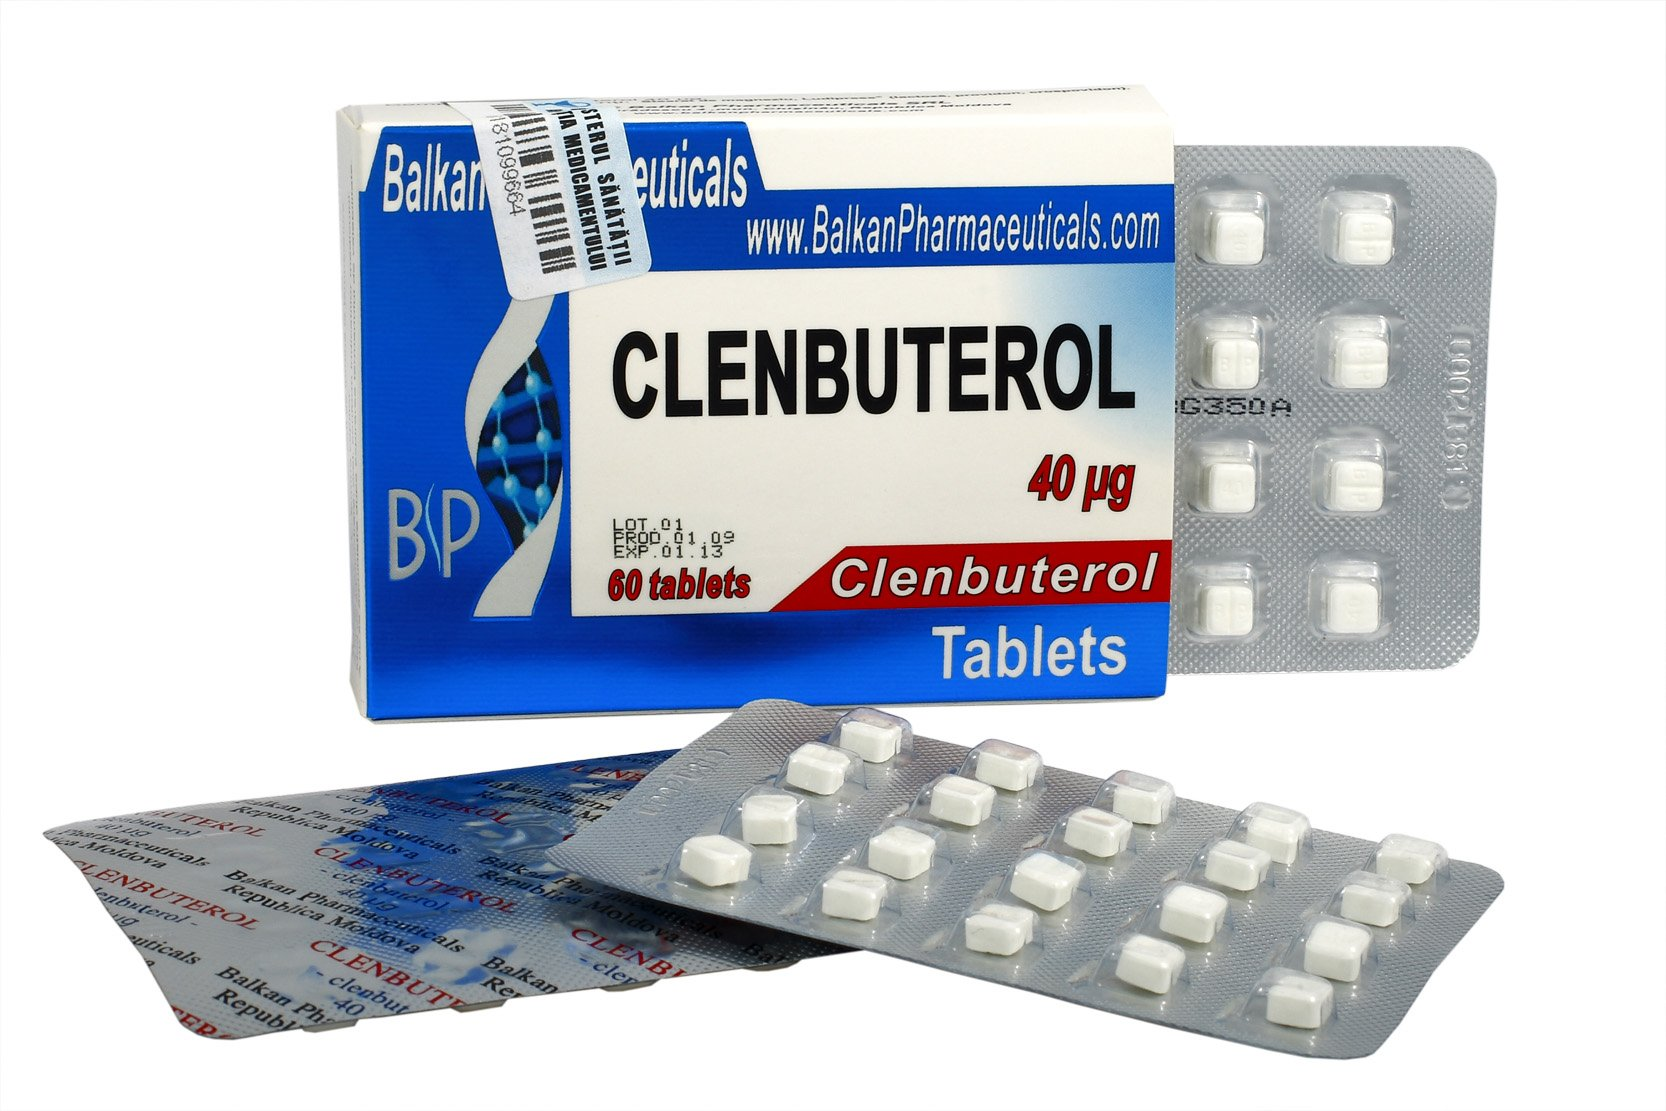 yansuan clenbuterol 40mcg esteroides y diabetes